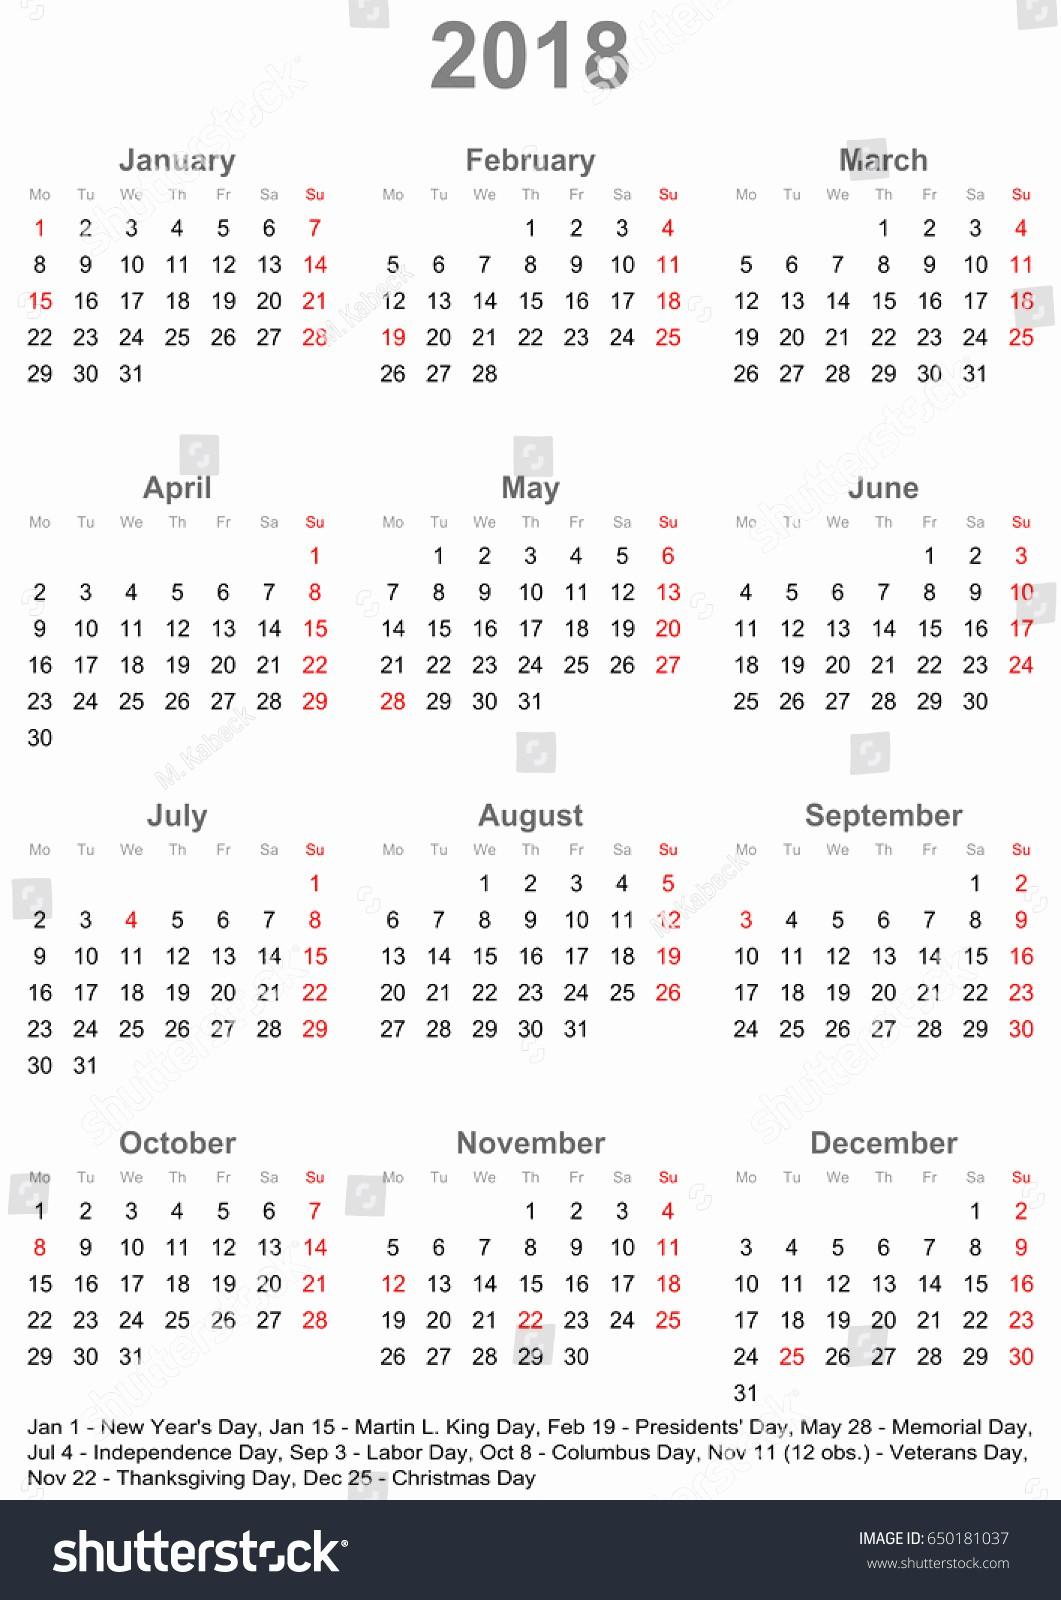 At A Glance 2018 Calendar Inspirational Simple Calendar 2018 E Year Glance Stock Vector